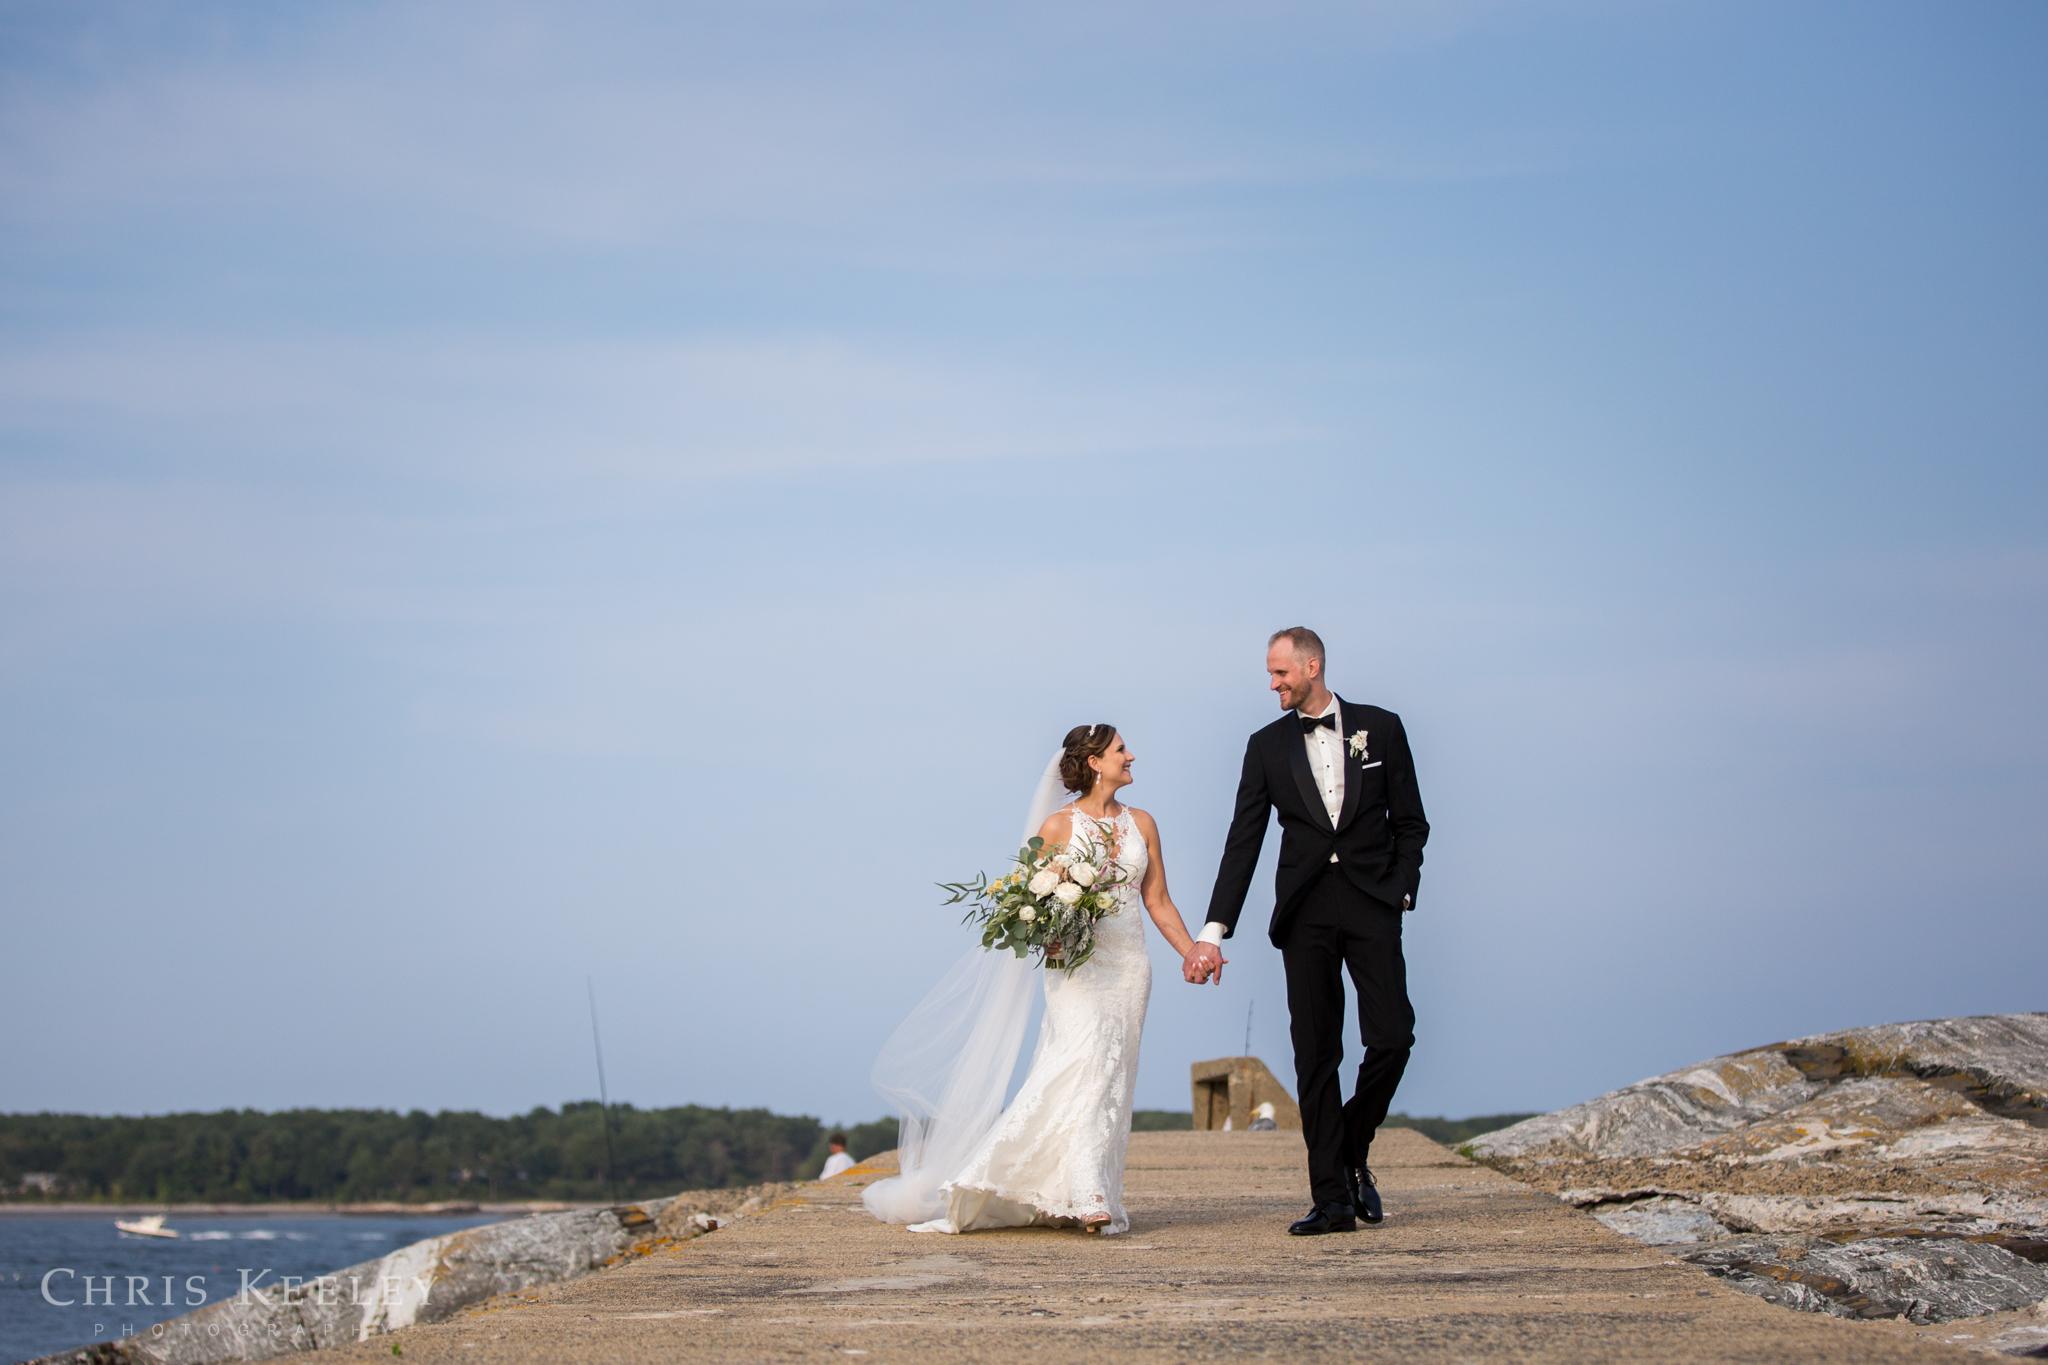 mombo-portsmouth-new-hampshire-wedding-photograper-48.jpg